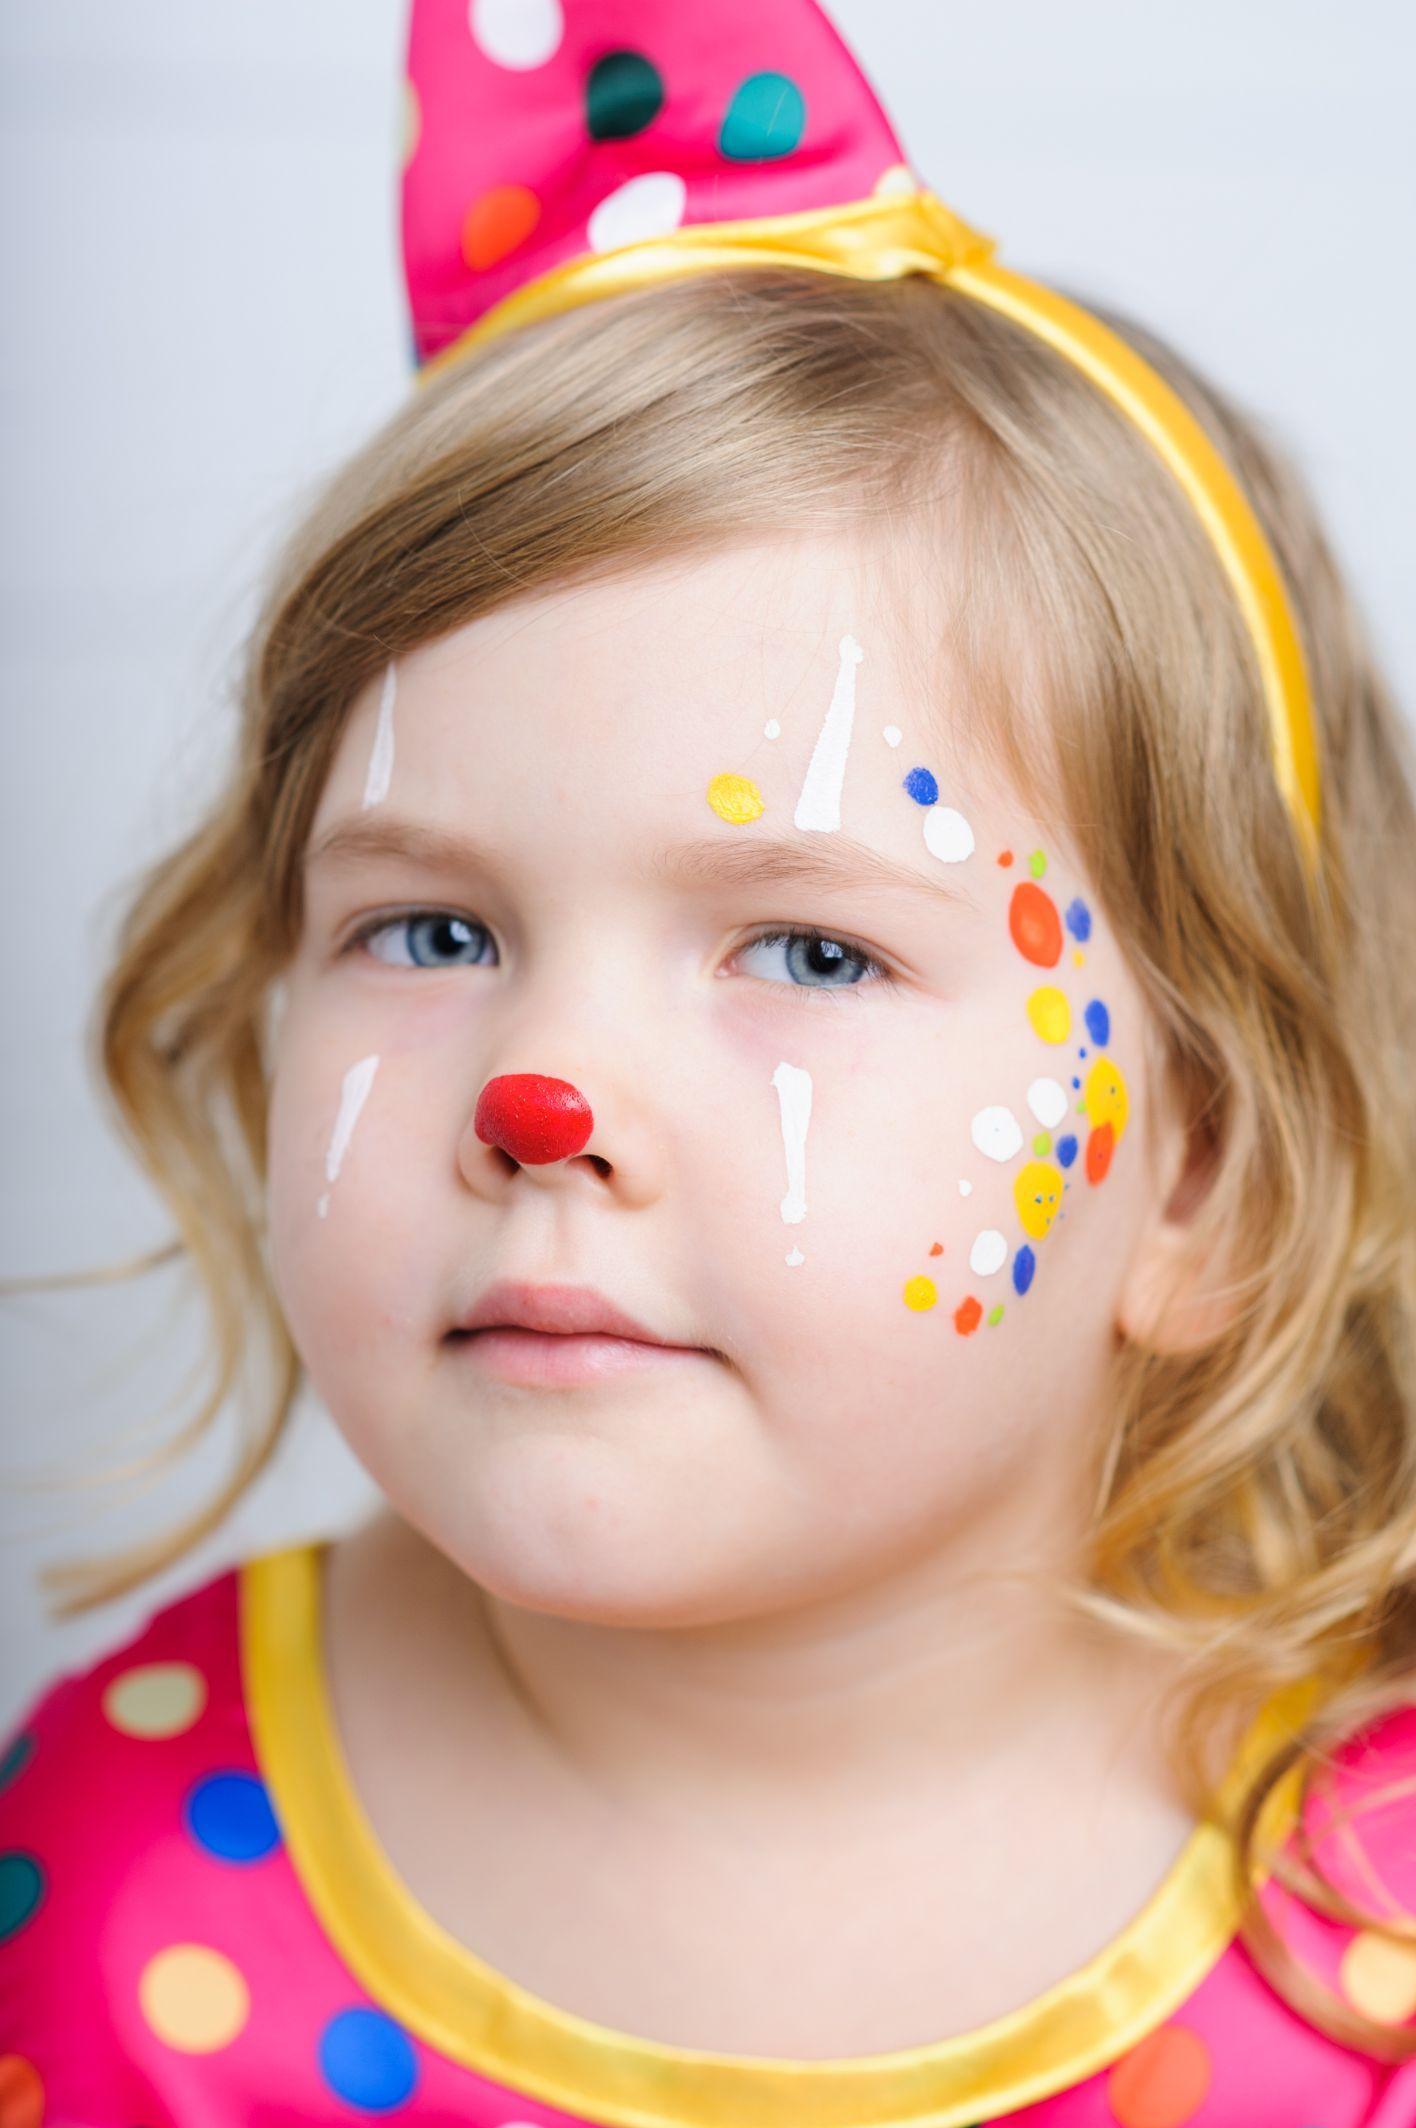 Clown Madchen Kinderschminken Kinderschminken Kinder Guide